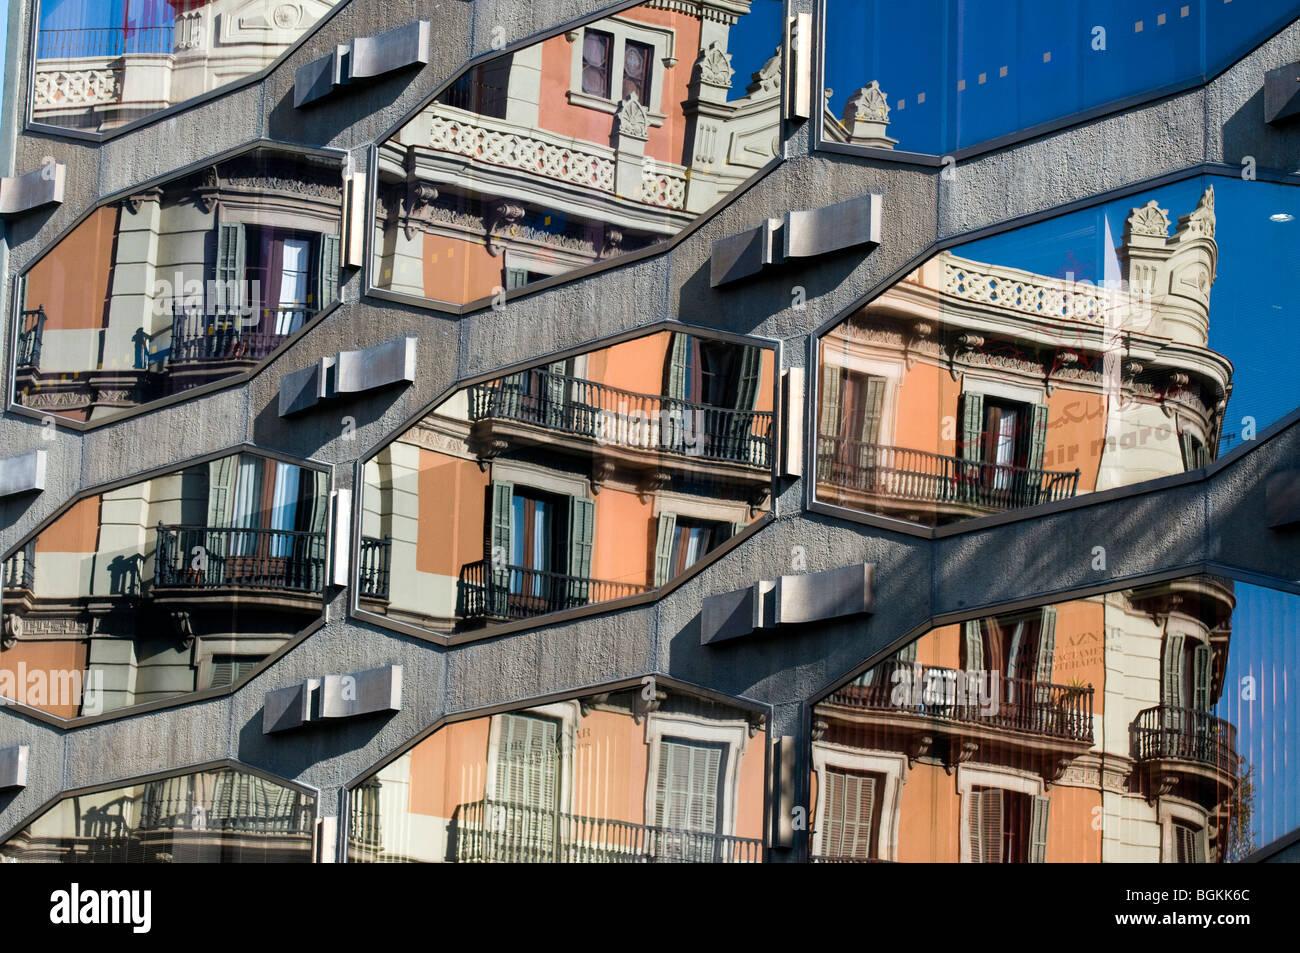 Neu- und Altbauten Reflexion in Plaça de Urquinaona, Barcelona, Katalonien, Spanien Stockfoto